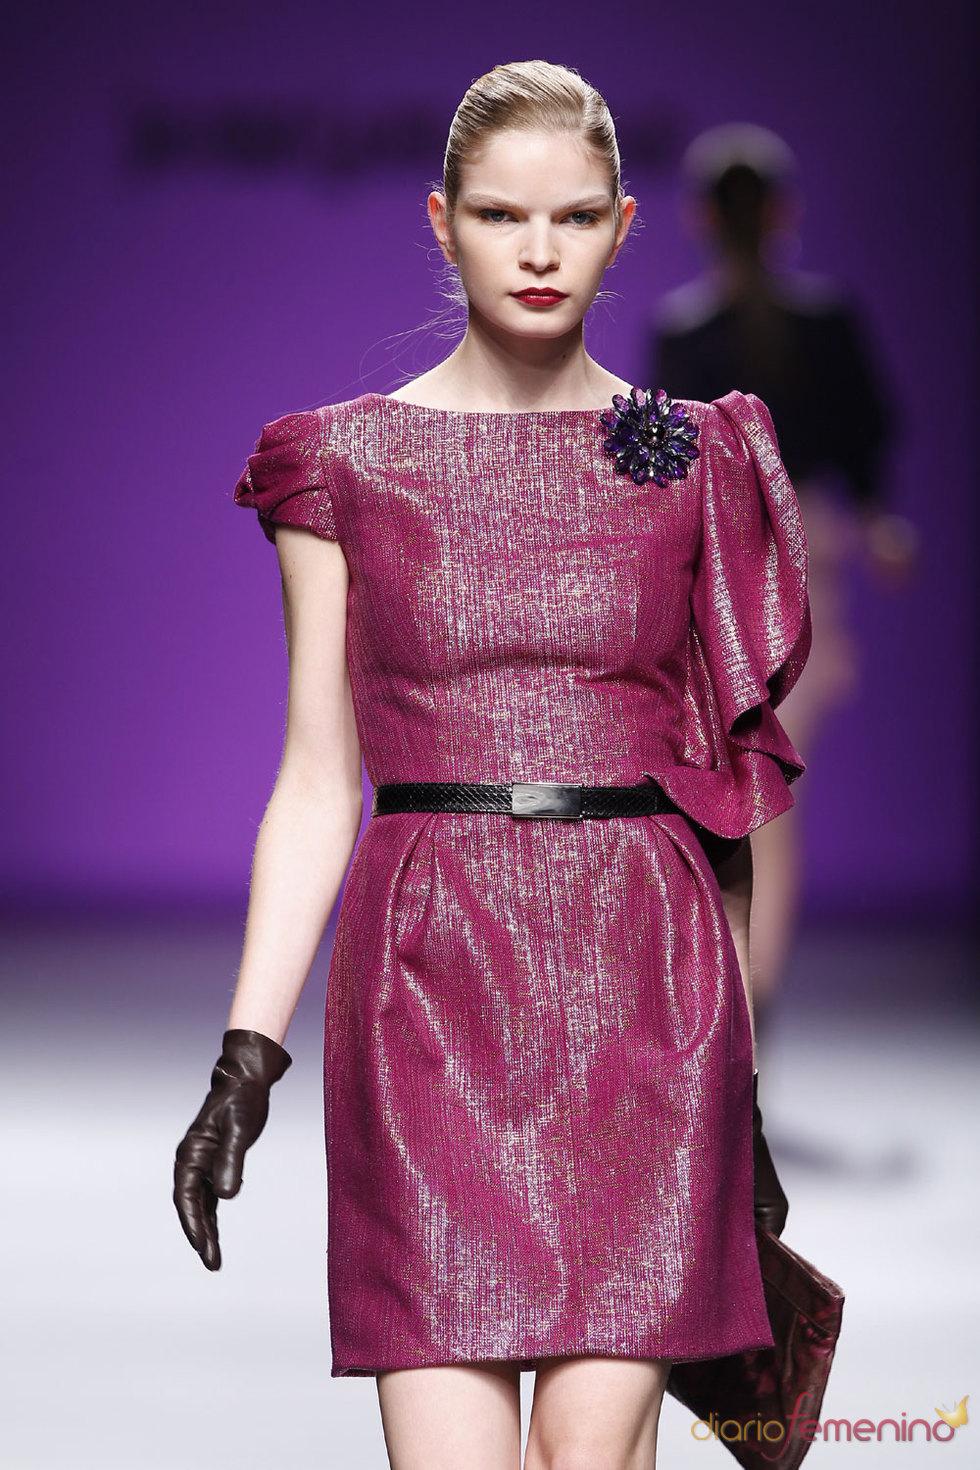 Moda Mujer 2010-2011 de Javier Larrainzar